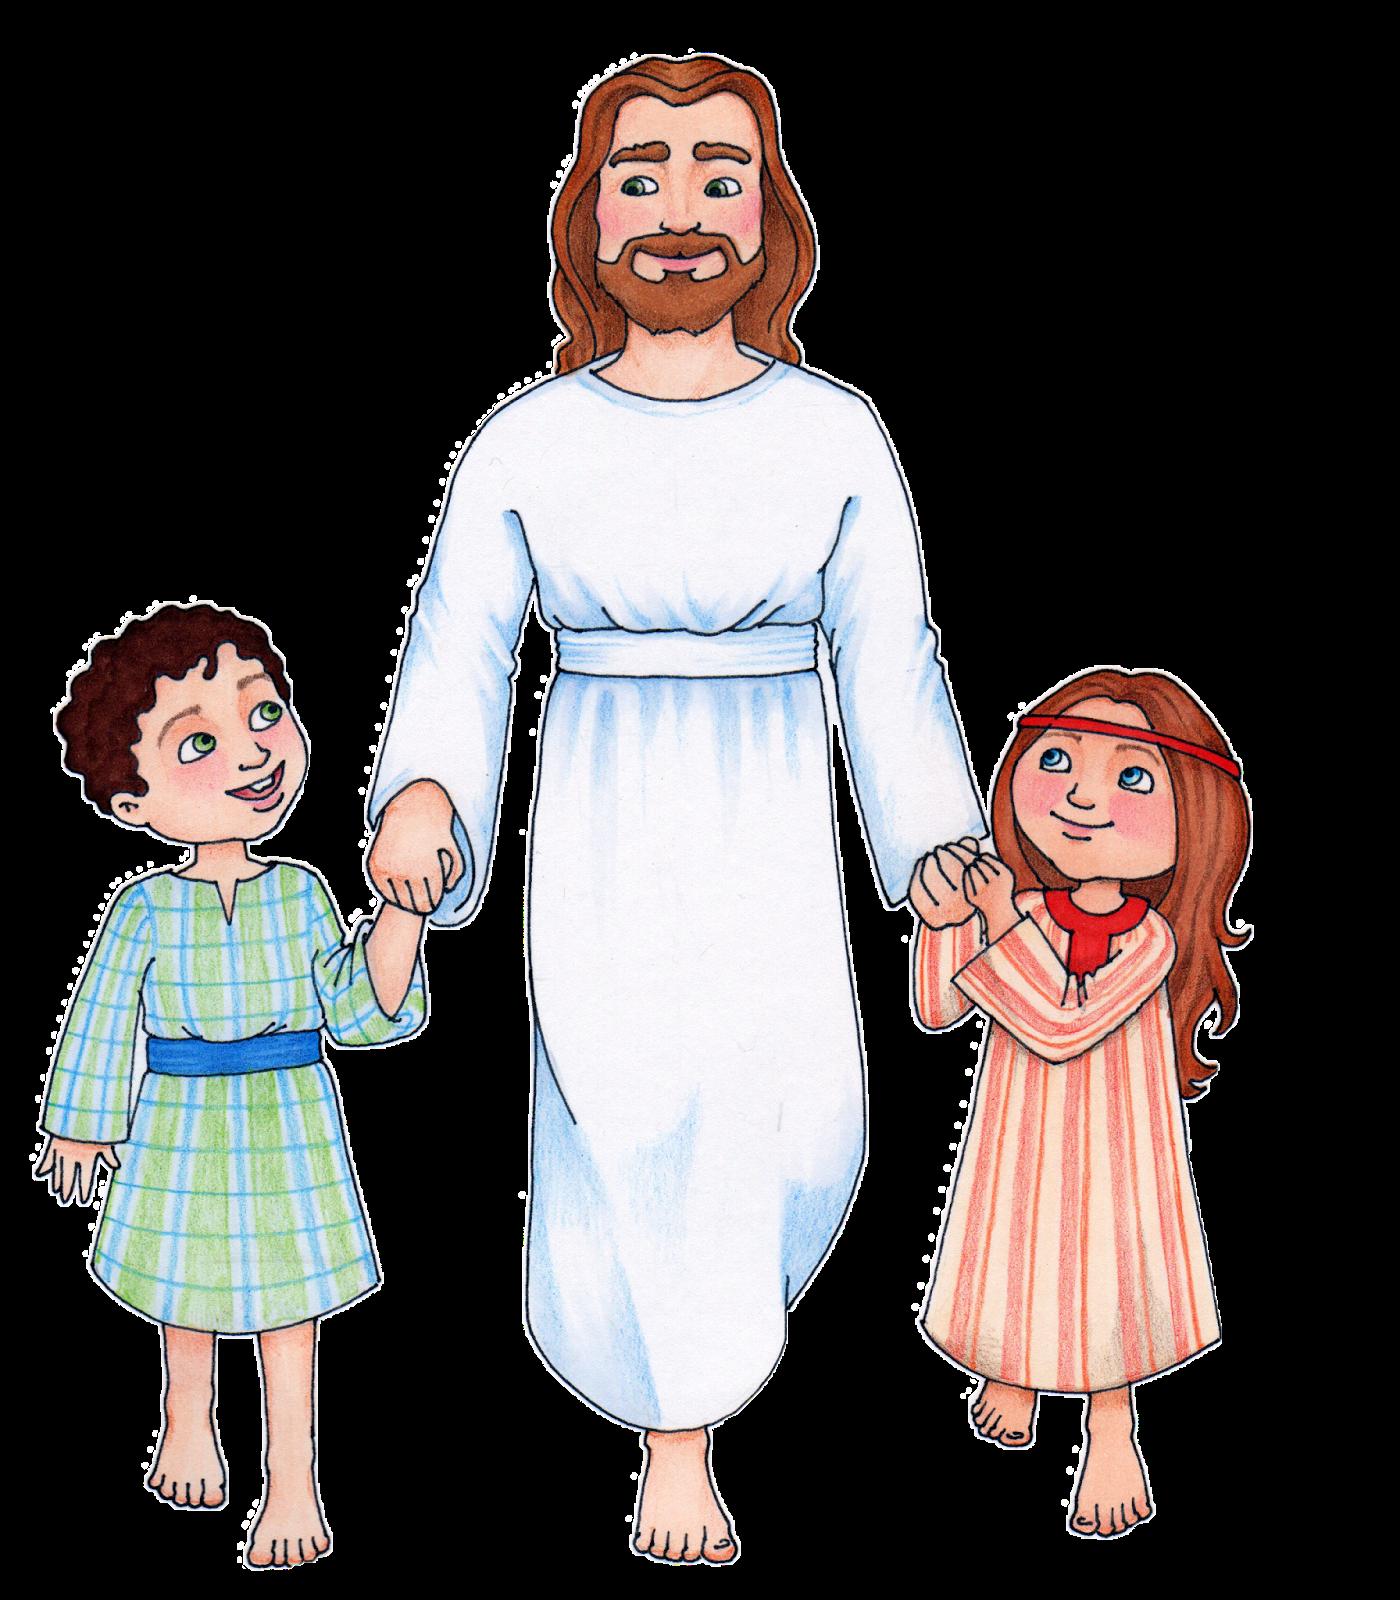 Clip art of jesus with .-Clip art of jesus with .-16